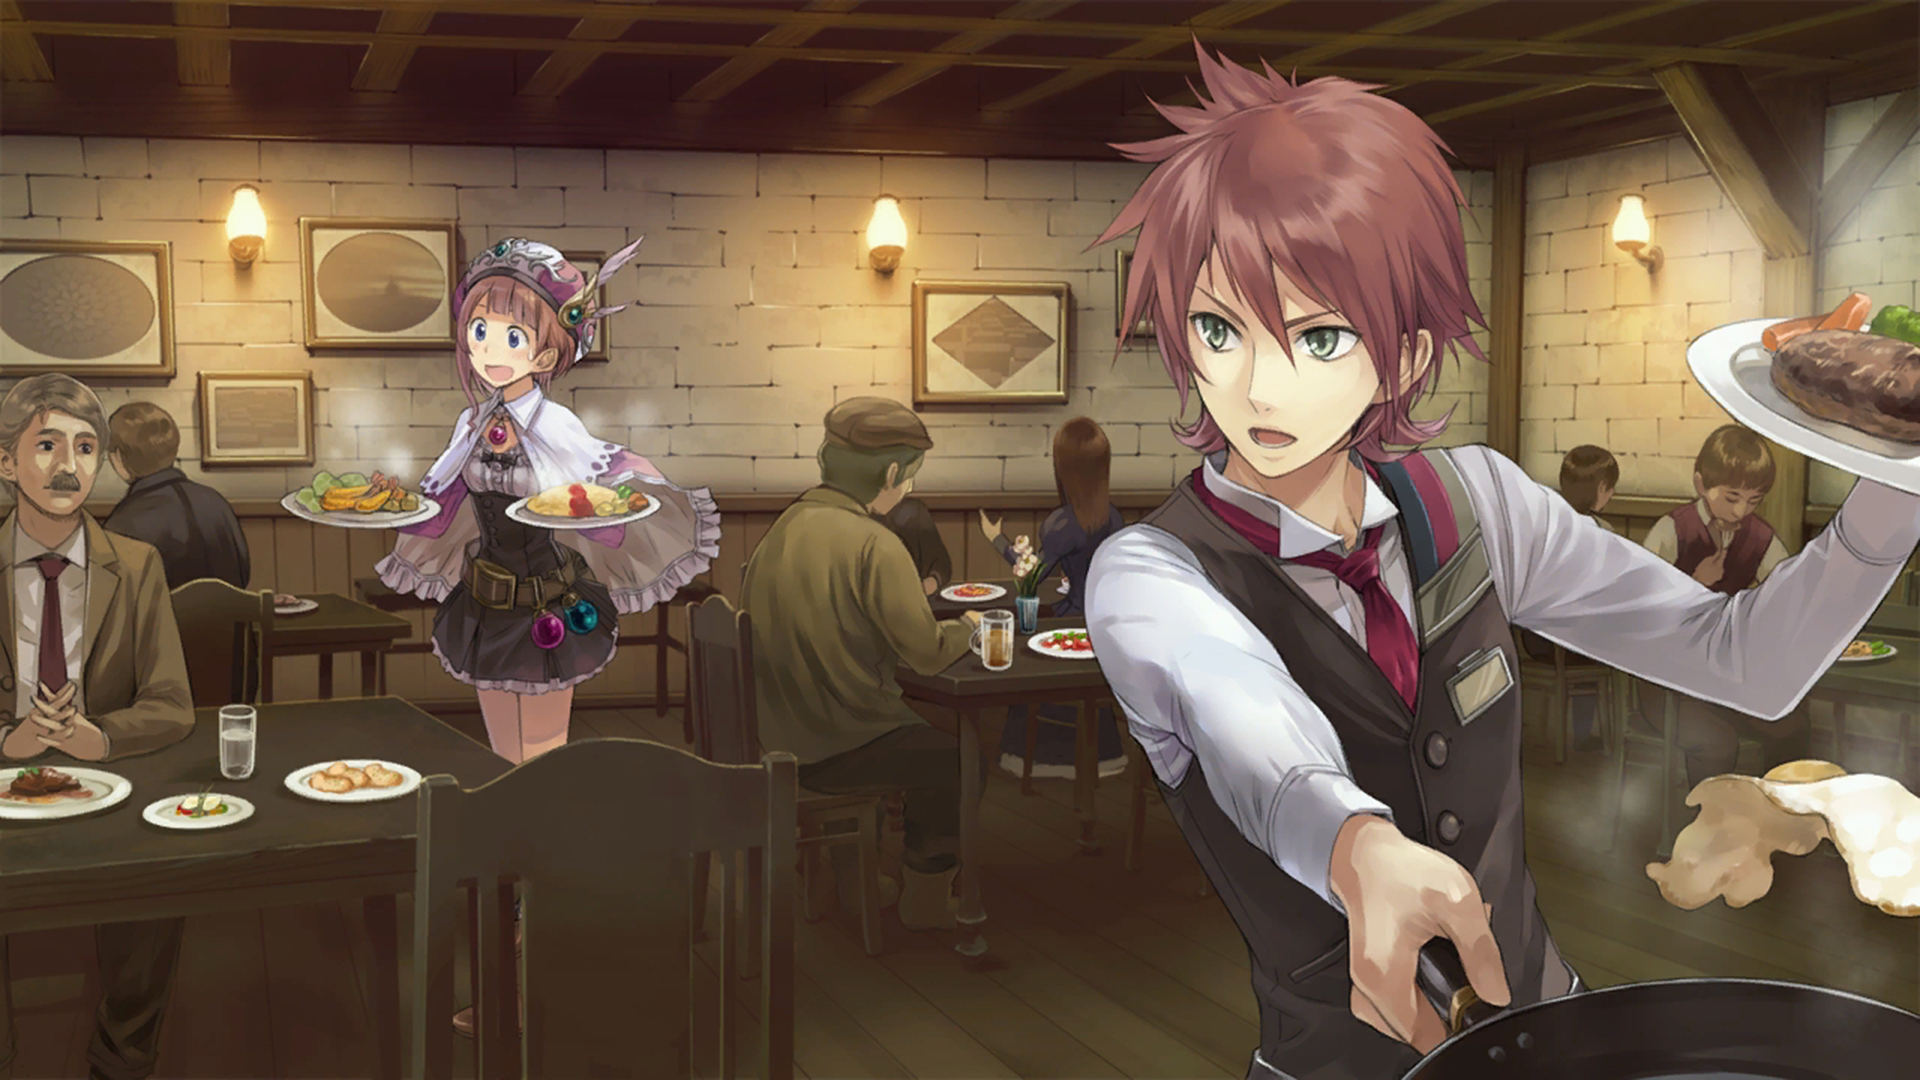 Atelier Rorona The Alchemist of Arland Wallpaper 026